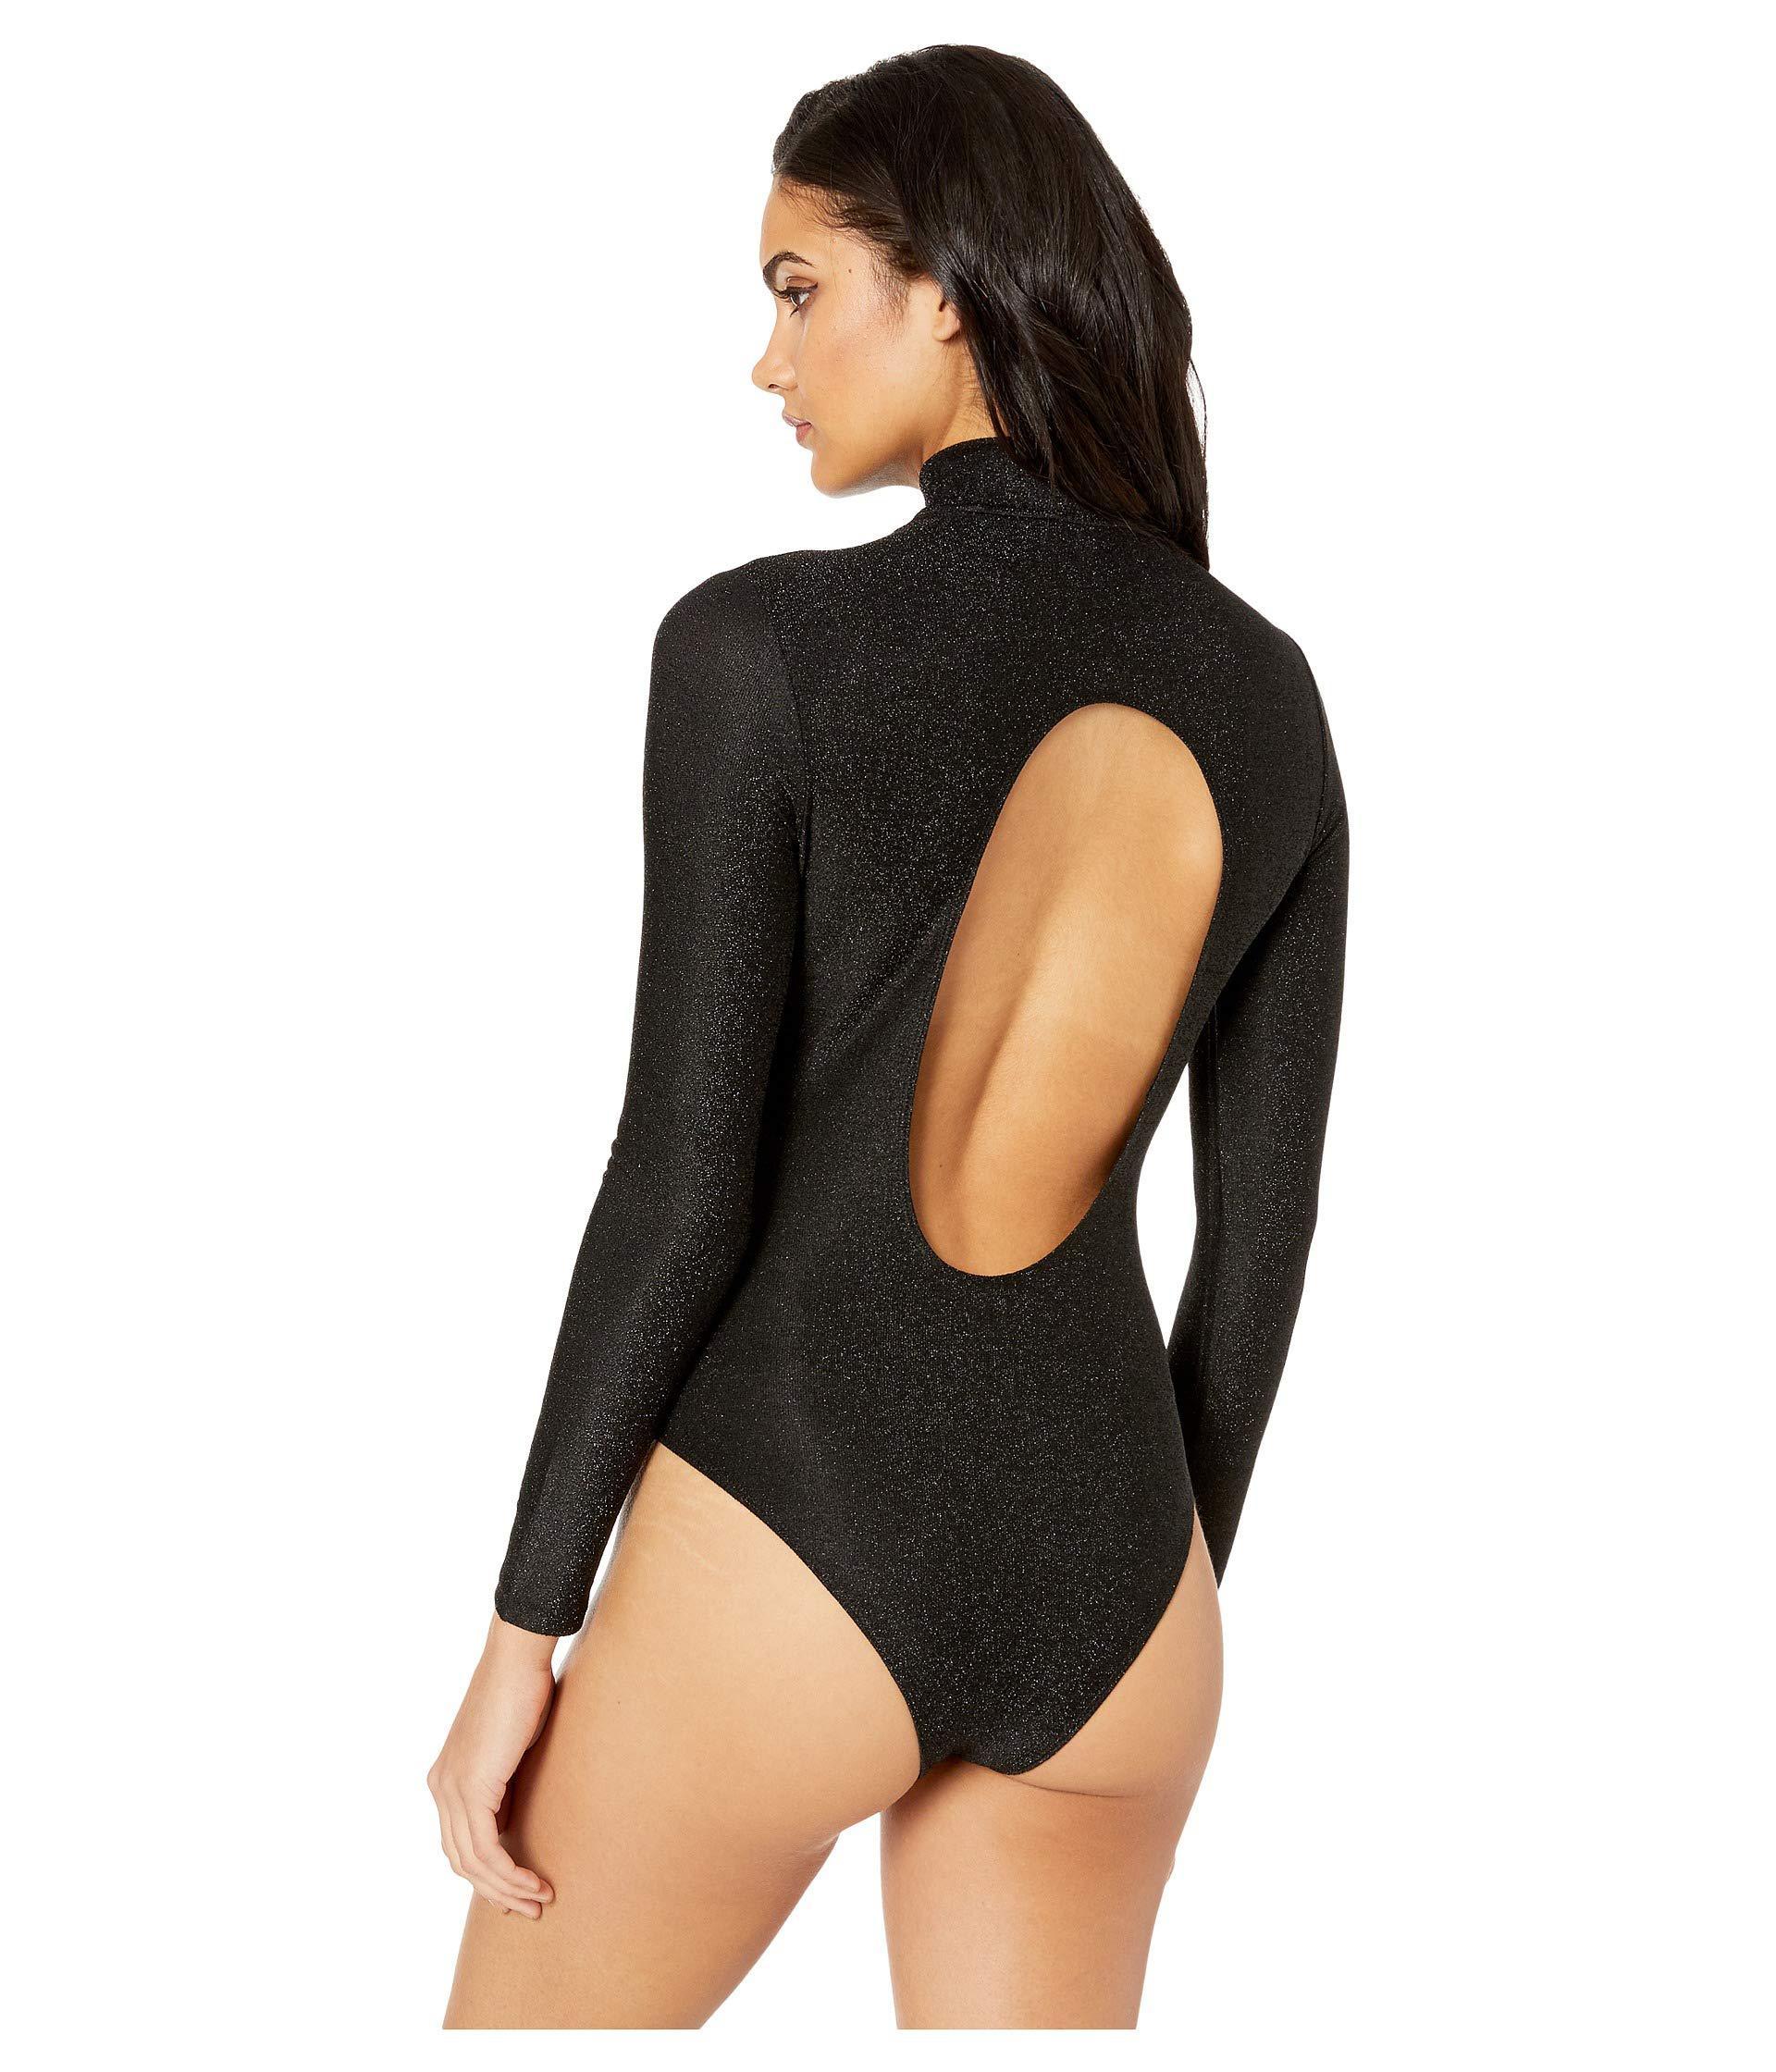 ... Black Metallic Bodysuit In Brixton (brixton) Women s Jumpsuit   Rompers  One. View fullscreen e355c67e4